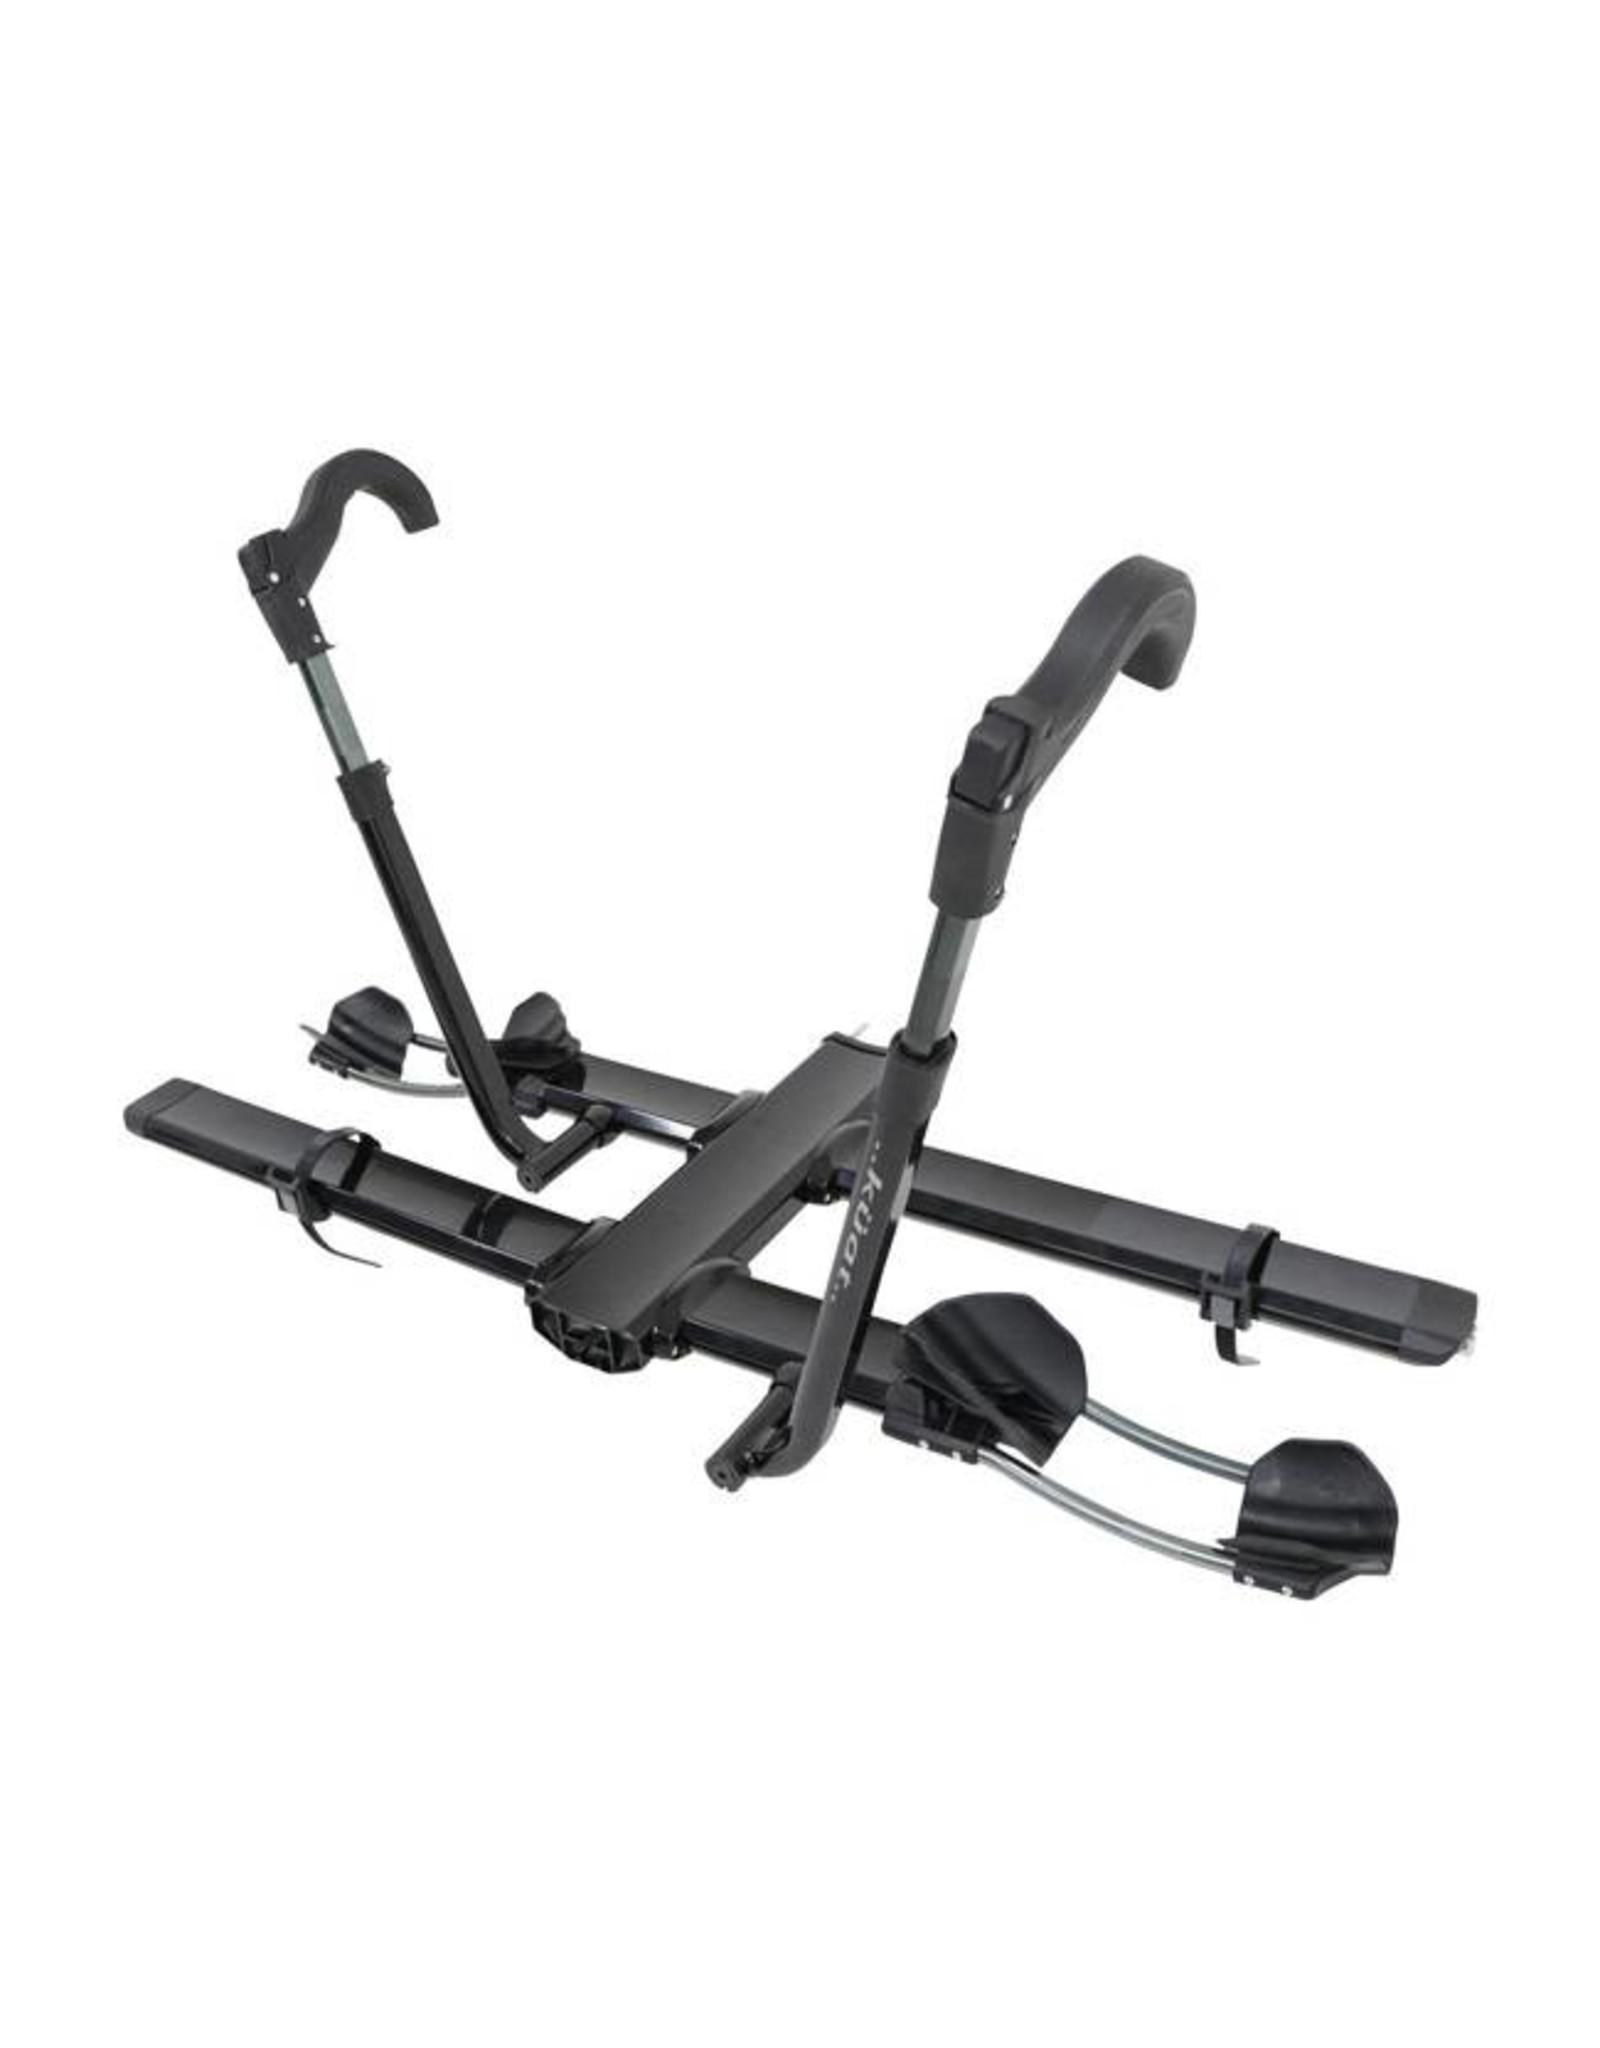 Kuat Kuat NV 2.0 +2-Bike Tray Add-on Rack, Metallic Black  and Chrome